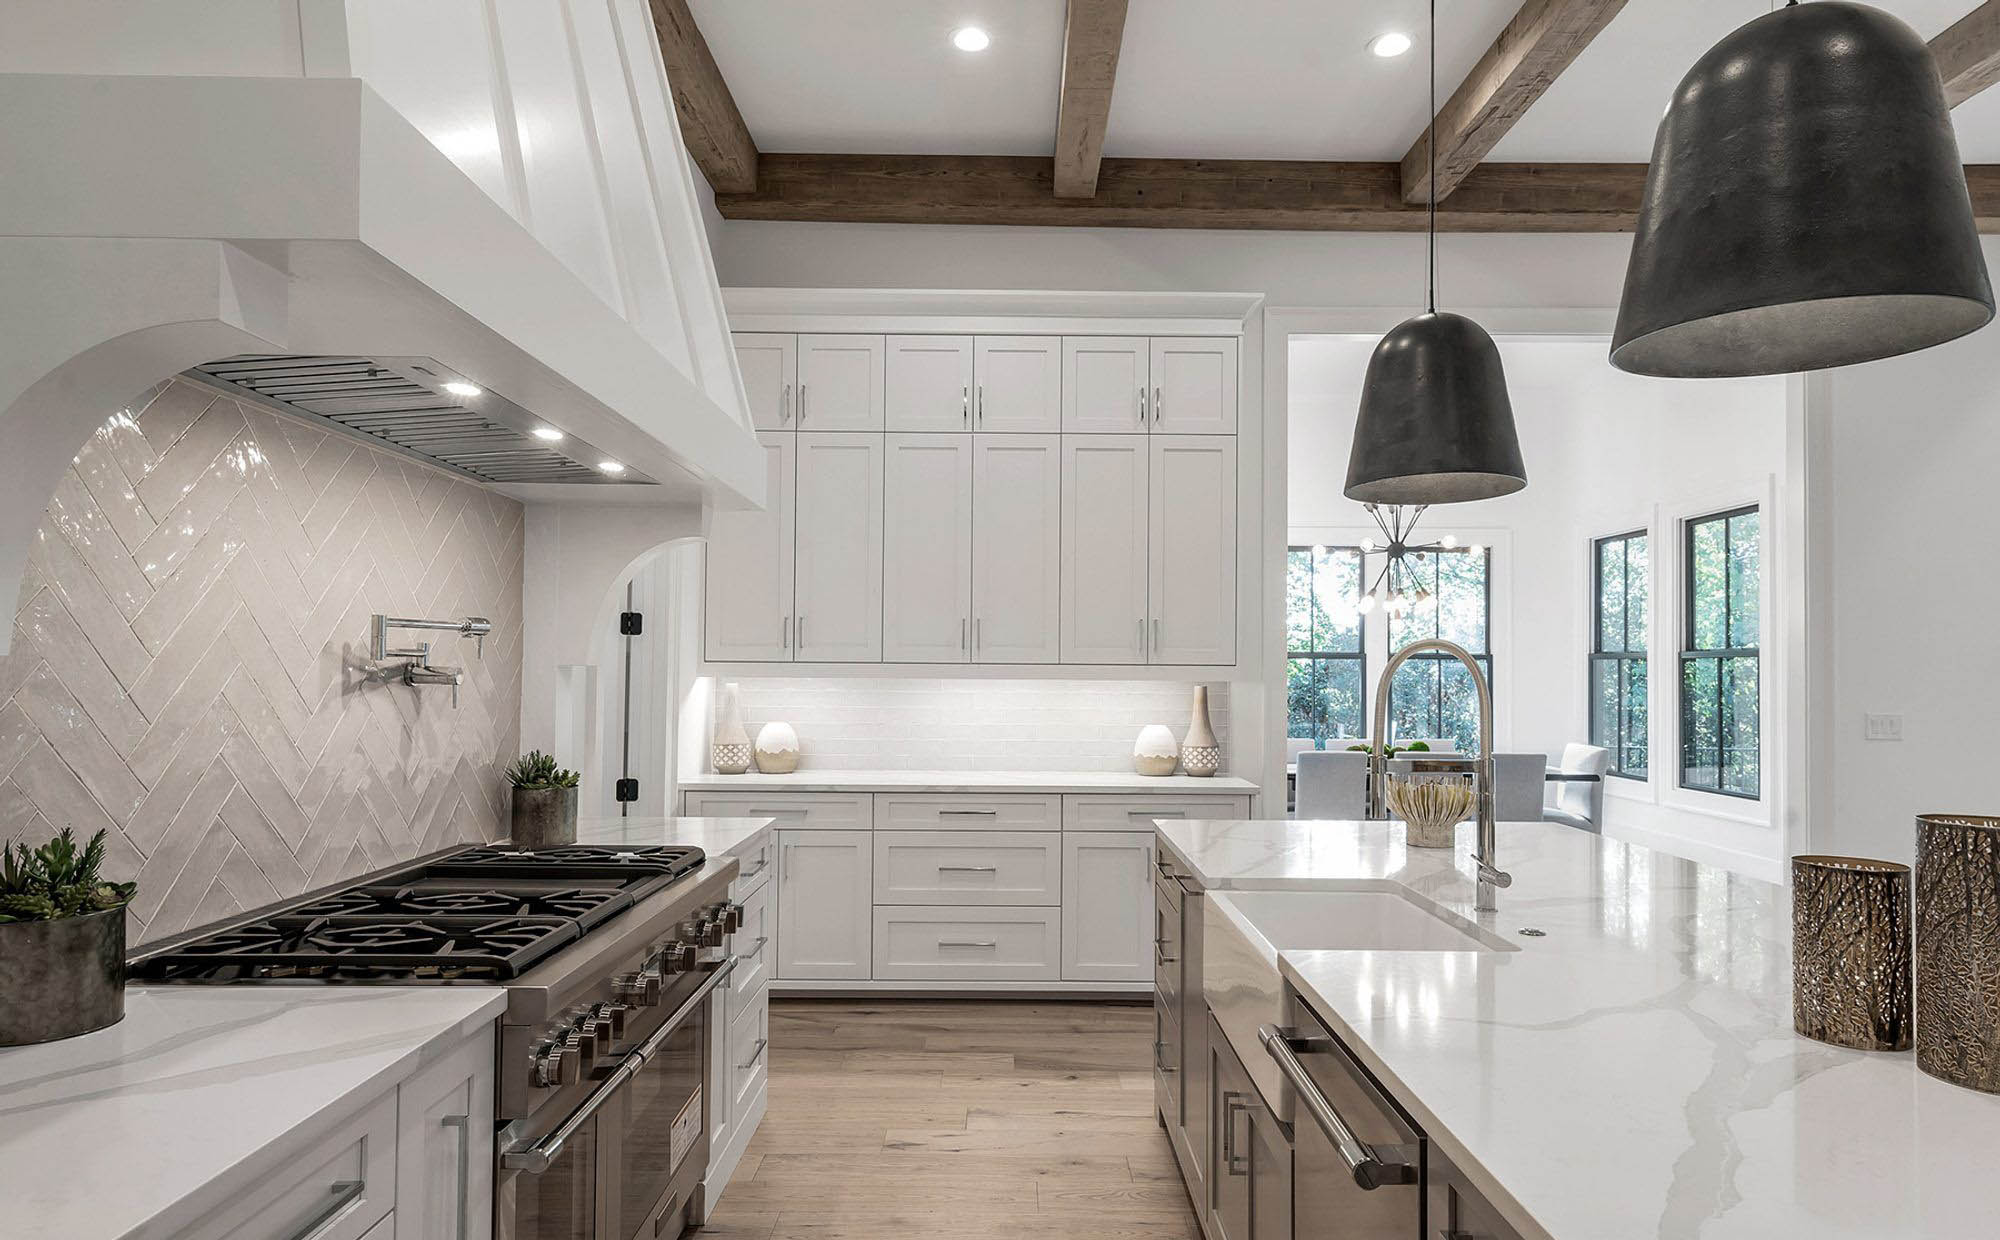 beautiful monochromatic warm luxury kitchen design shaker cabinets marble quartz countertops stainless appliances white farmhouse sink